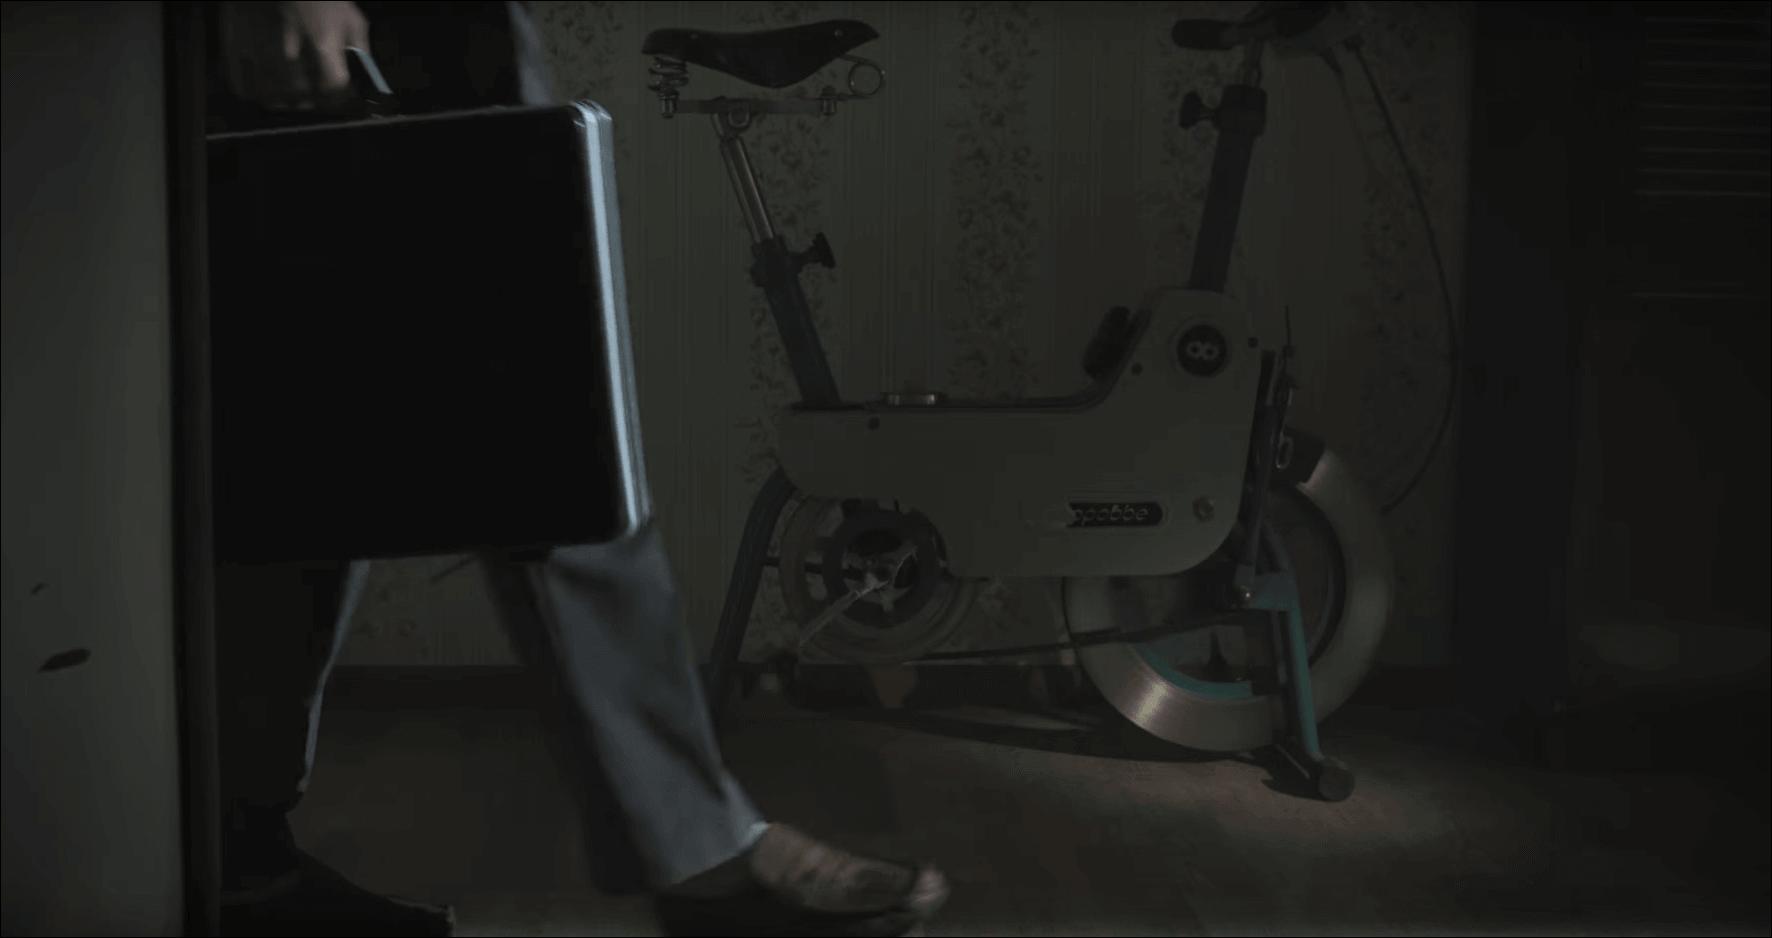 1 Фото квест комнаты Путешествие во времени в городе Киев